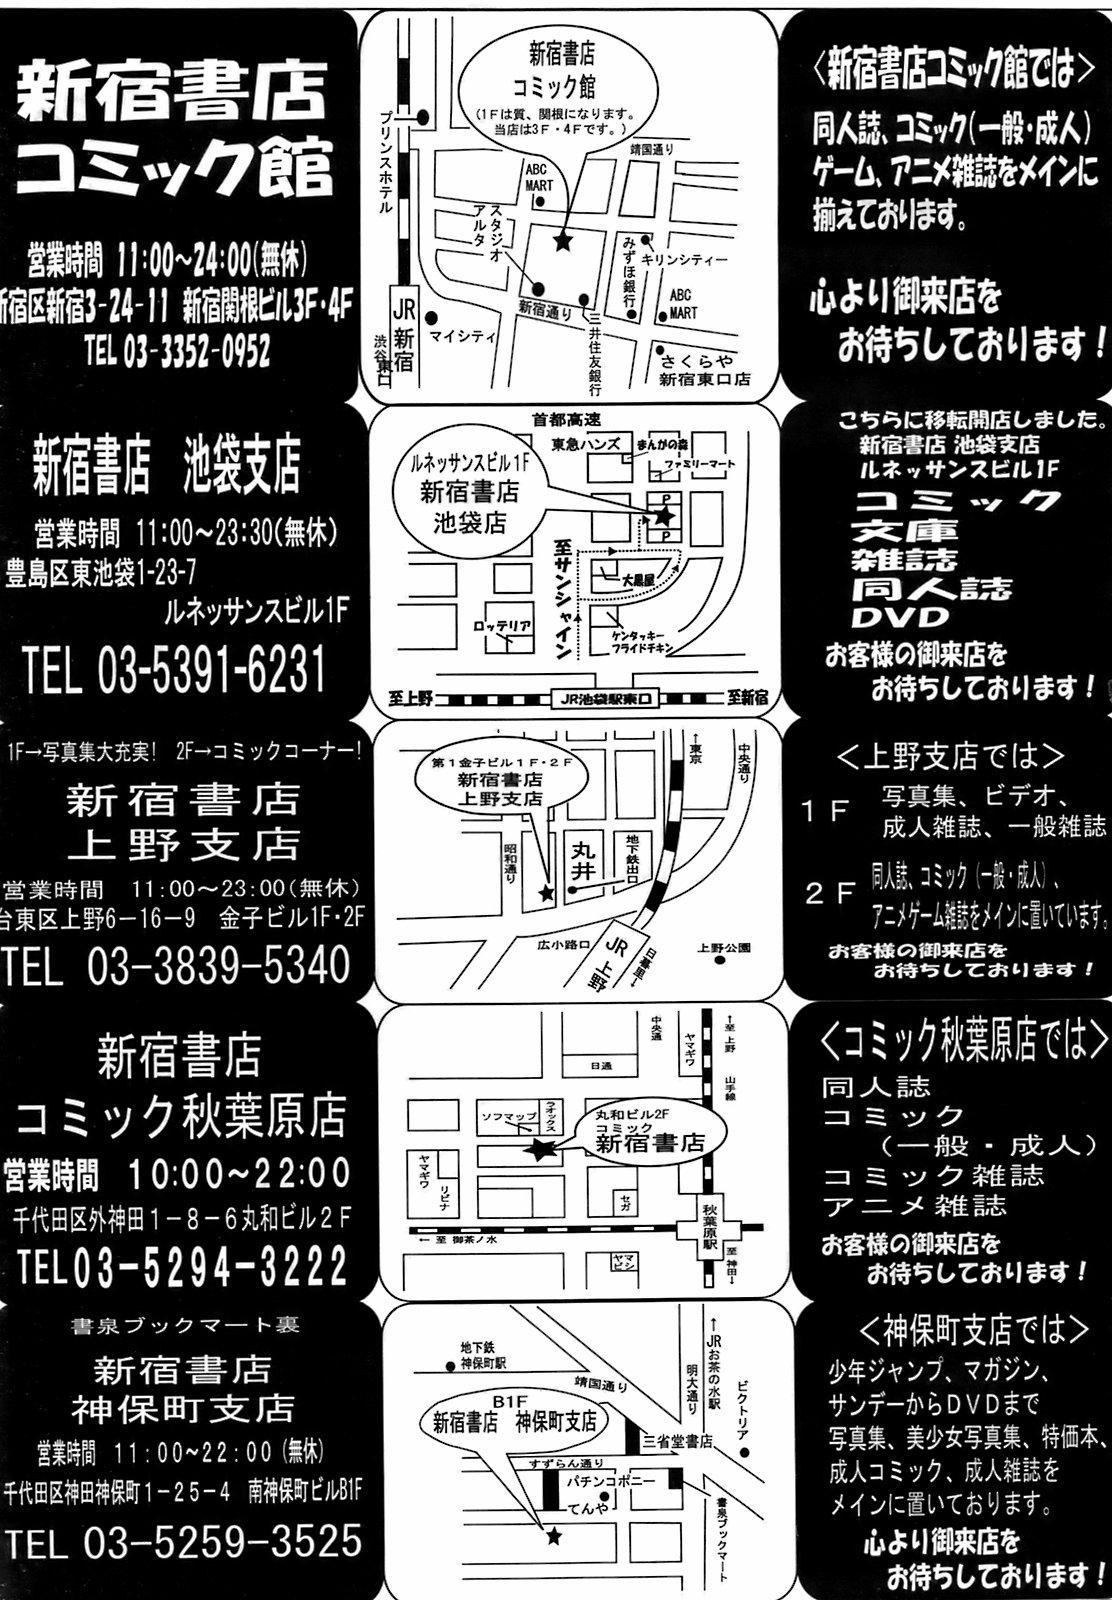 COMIC Megastore 2009-04 505